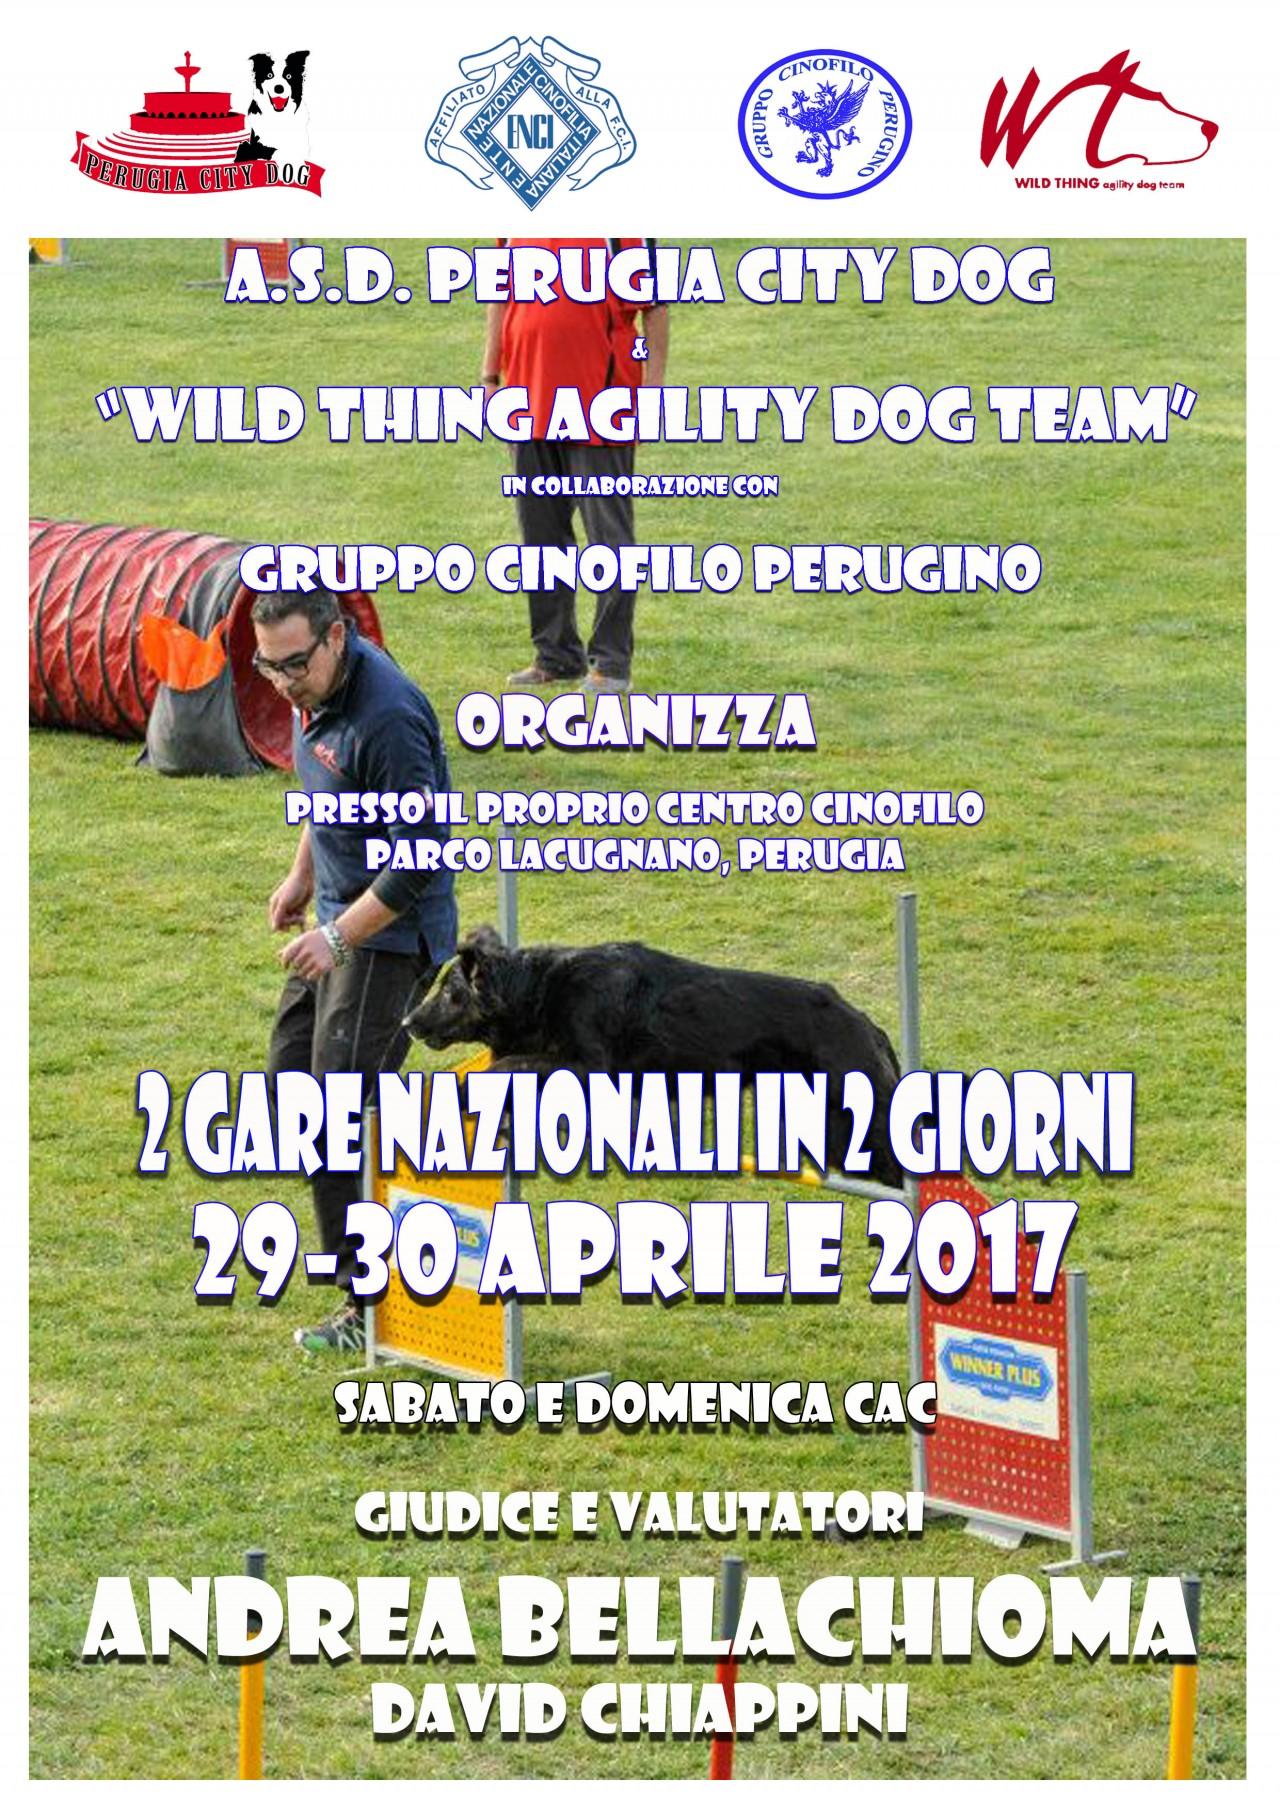 GARA NAZIONALE DI AGILITY DOG 29 aprile